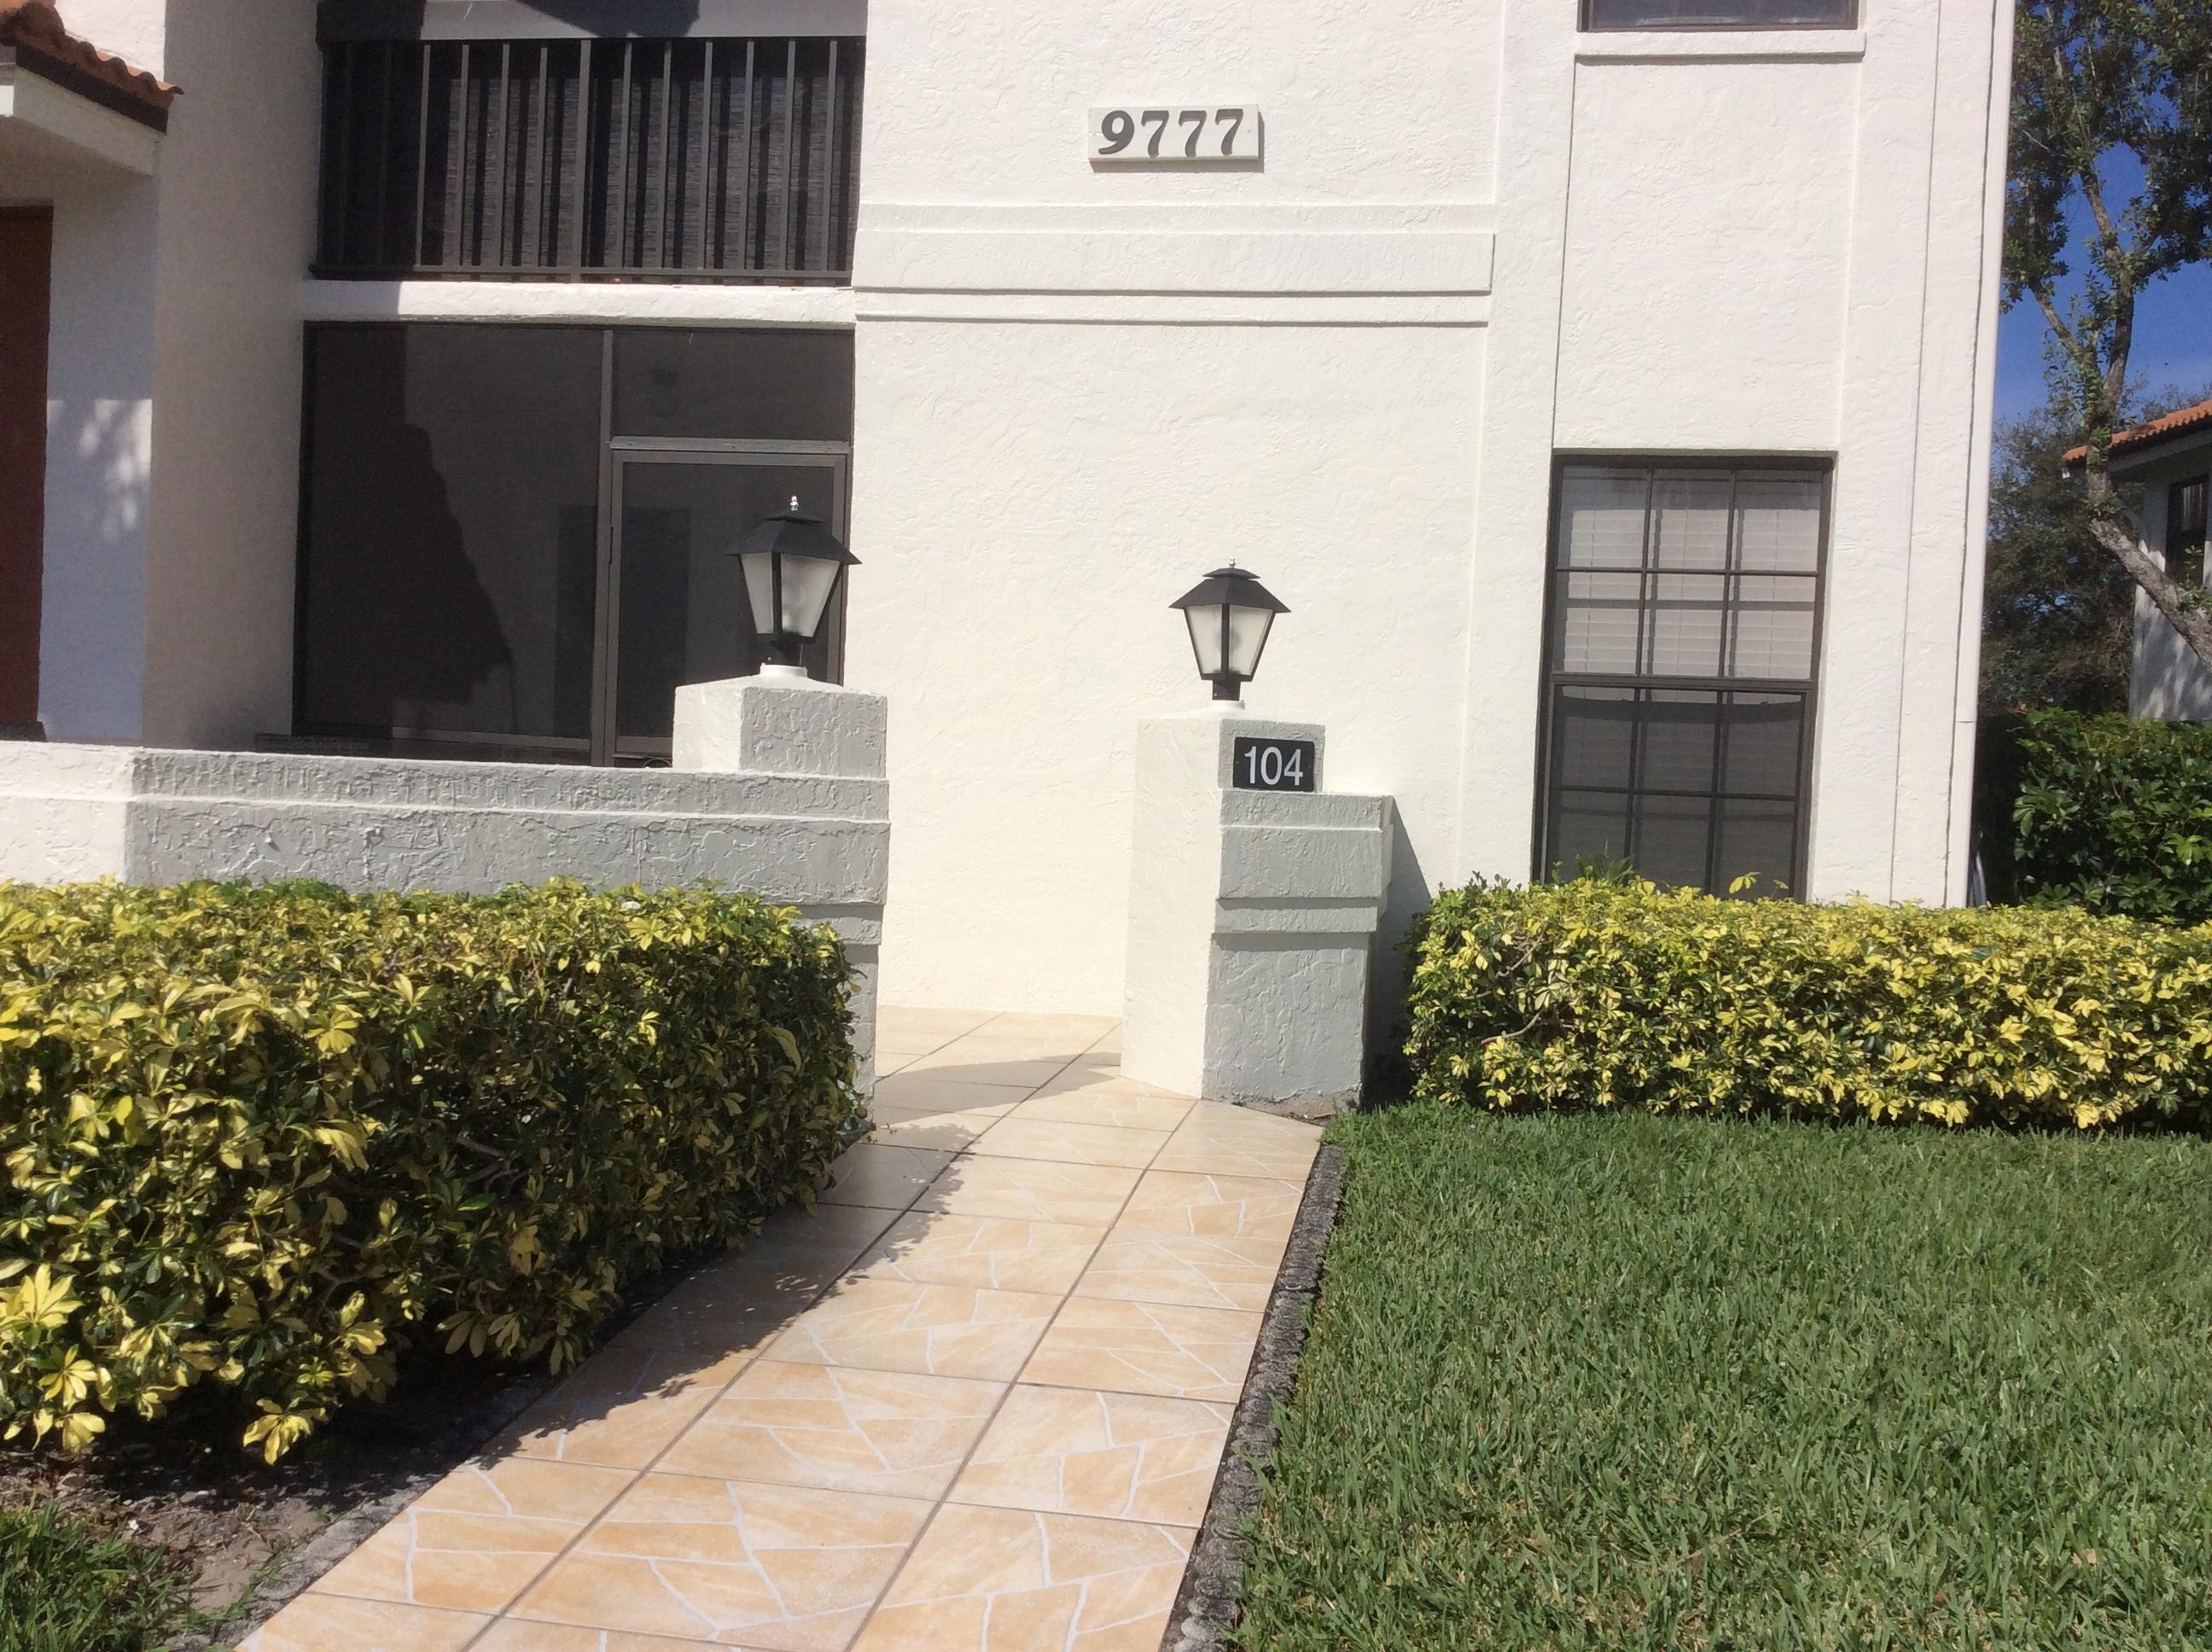 9777 Sills Drive 104 Boynton Beach, FL 33437